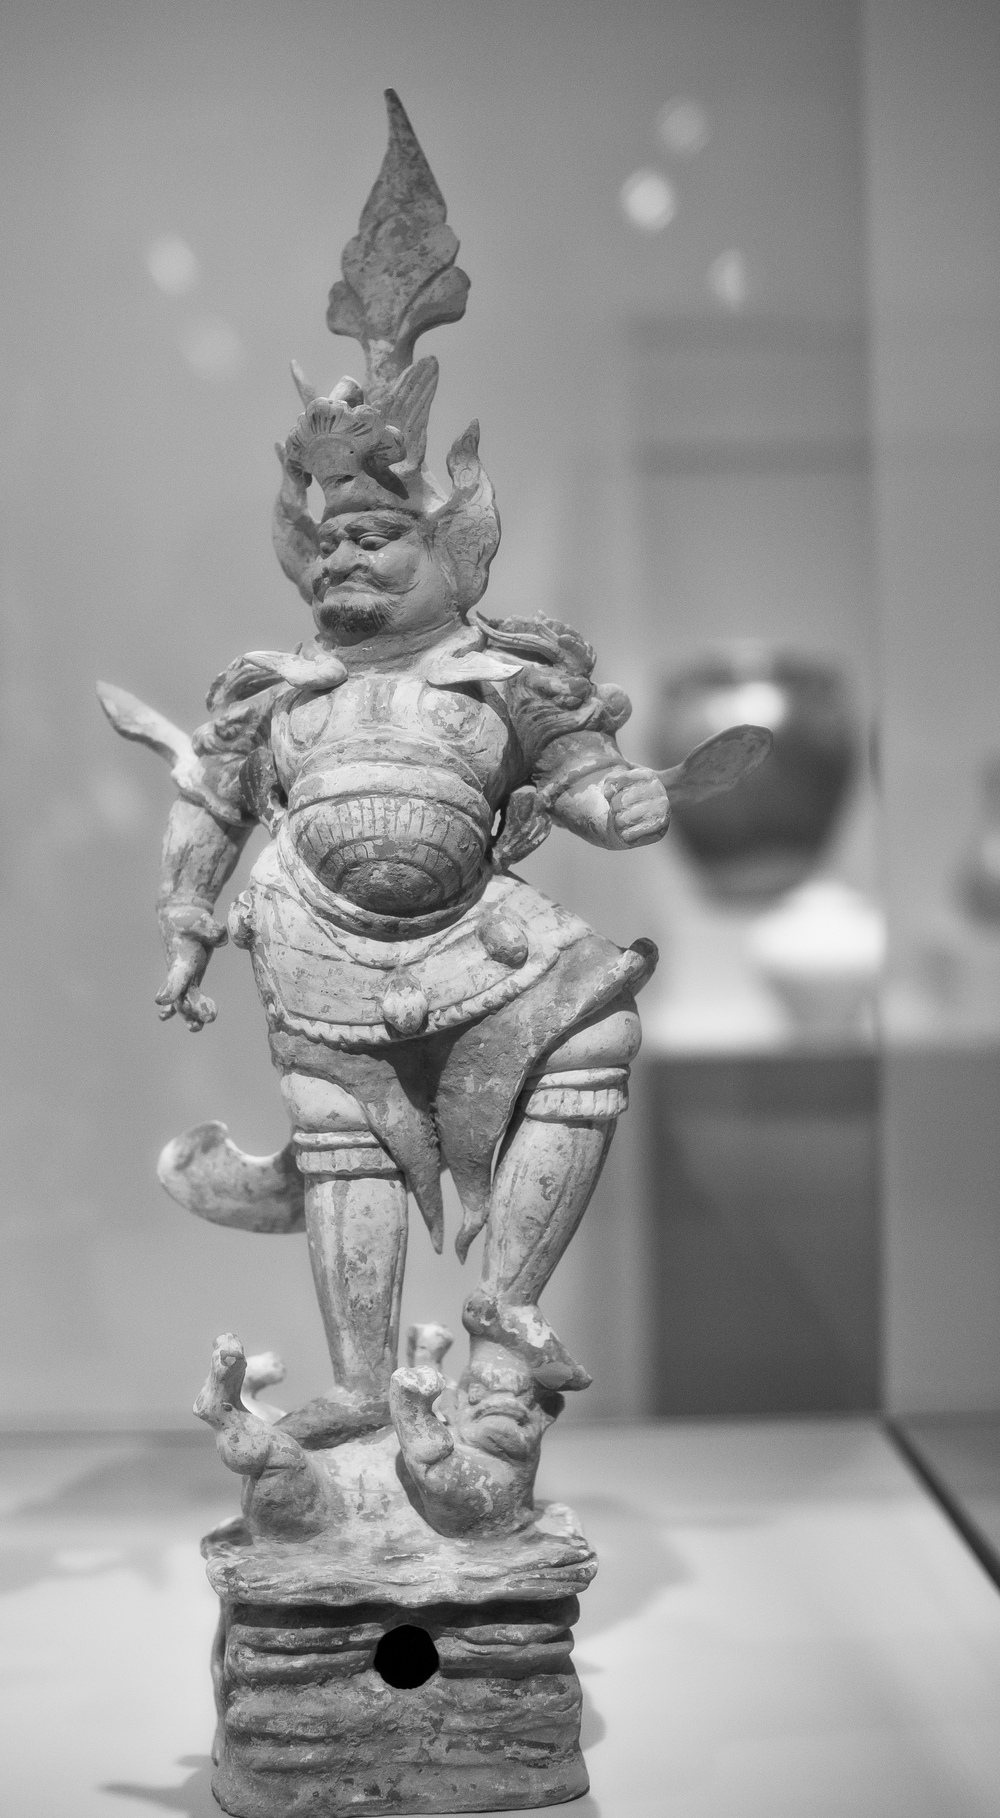 Columbia_SC_ArtMuseum_Figurine_1272013.jpg